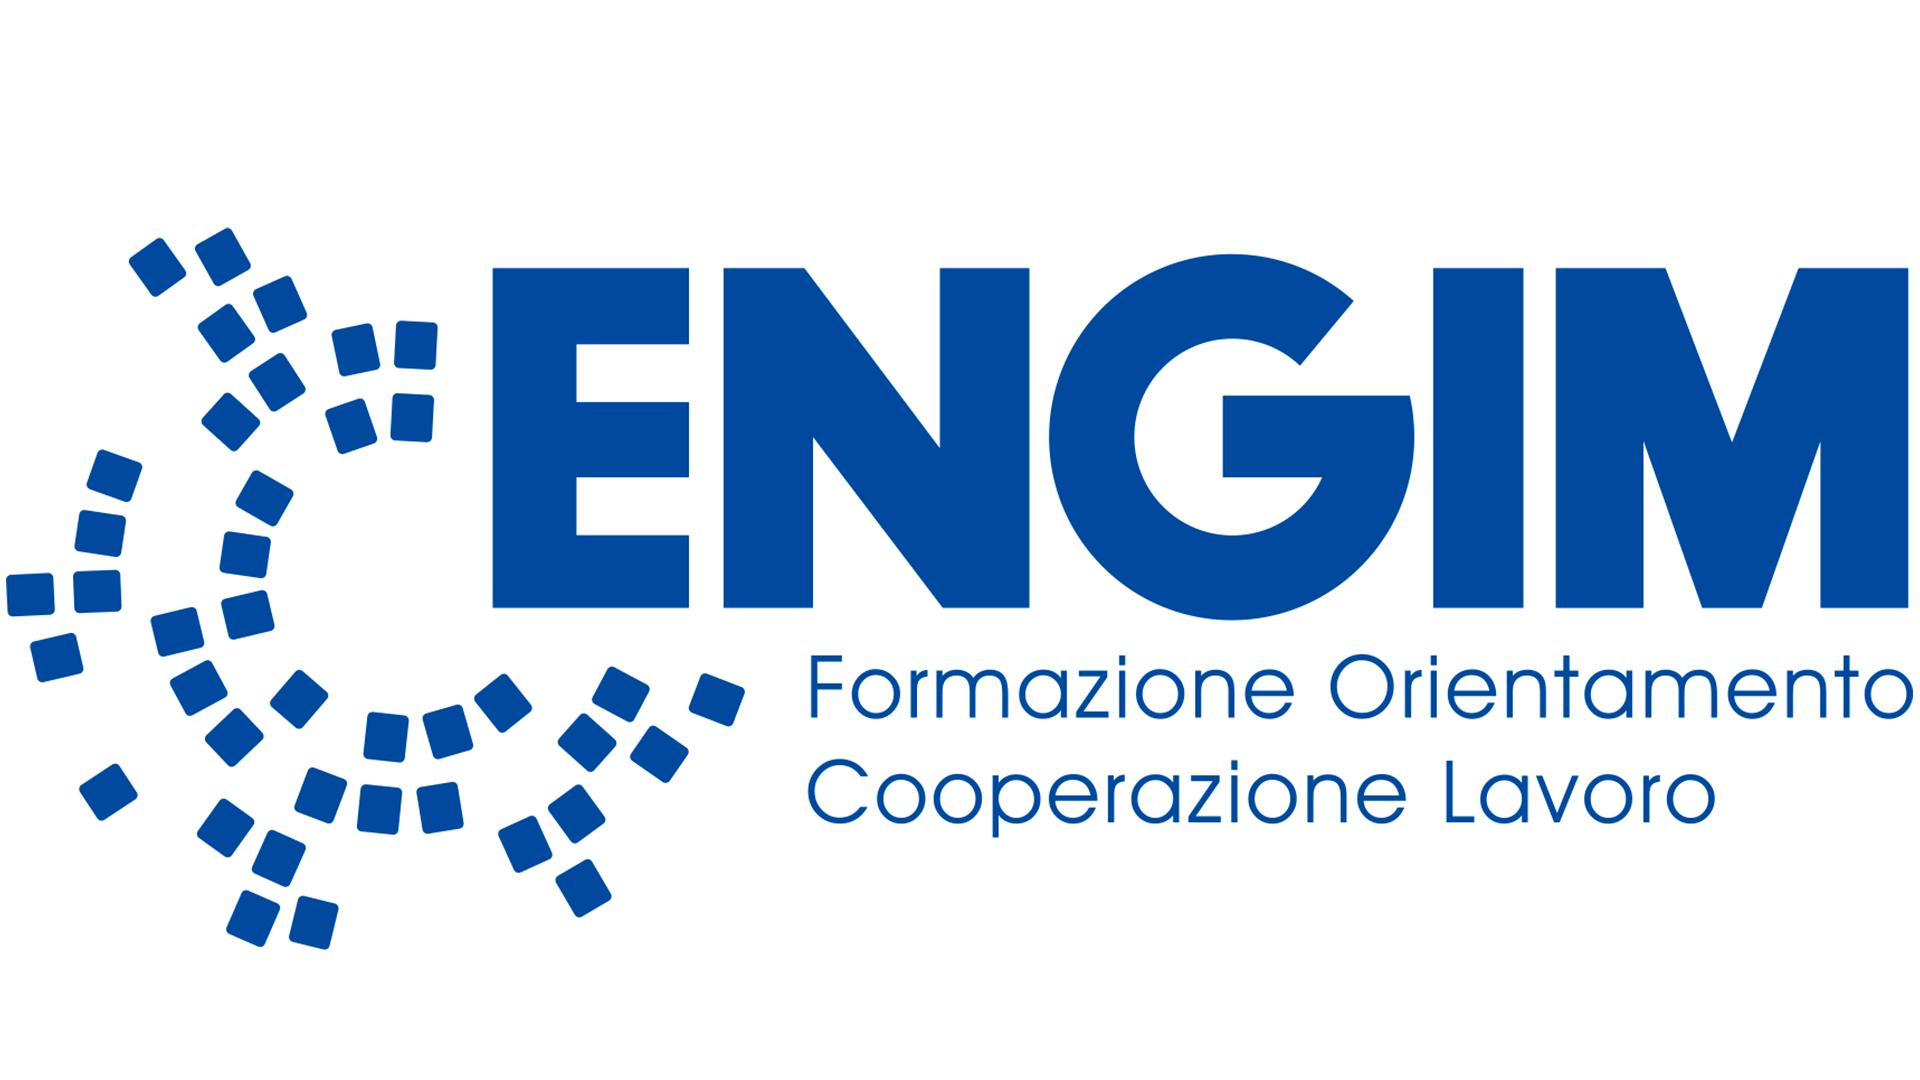 Fondazione Engim